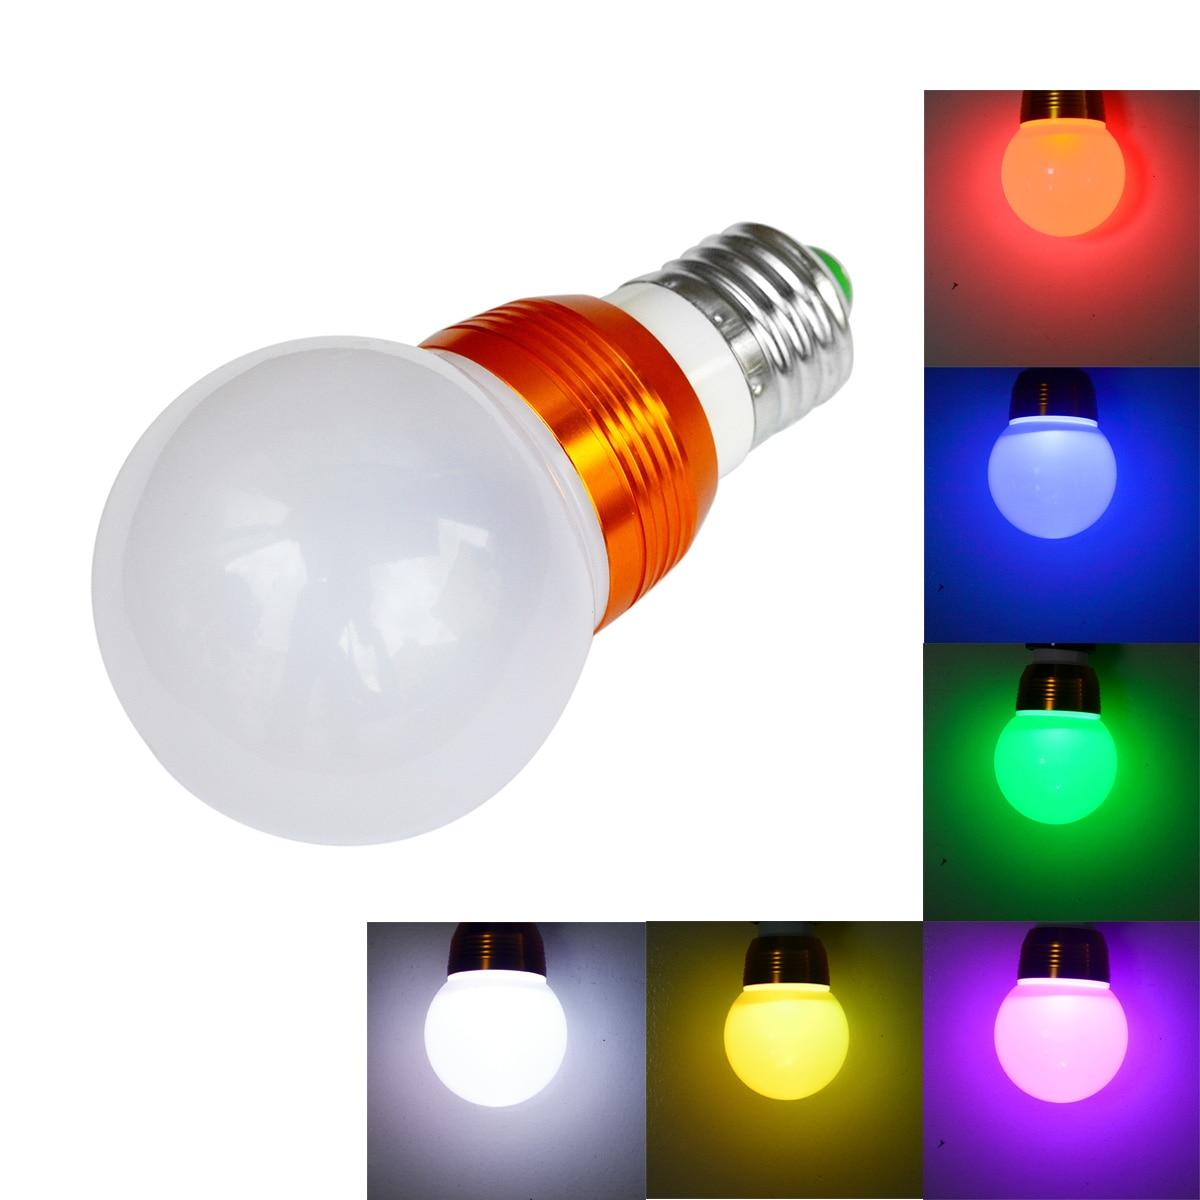 Jiawen 3W  E27 RGB LED Bulb 16 Color Change Lamp spotlight 85-265V for Home Party decoration with IR Remote электрический камин к к alex bauman bellagio a 29 фронтальный дуб средний к42 с в ab 02 29 wm067к42 839280